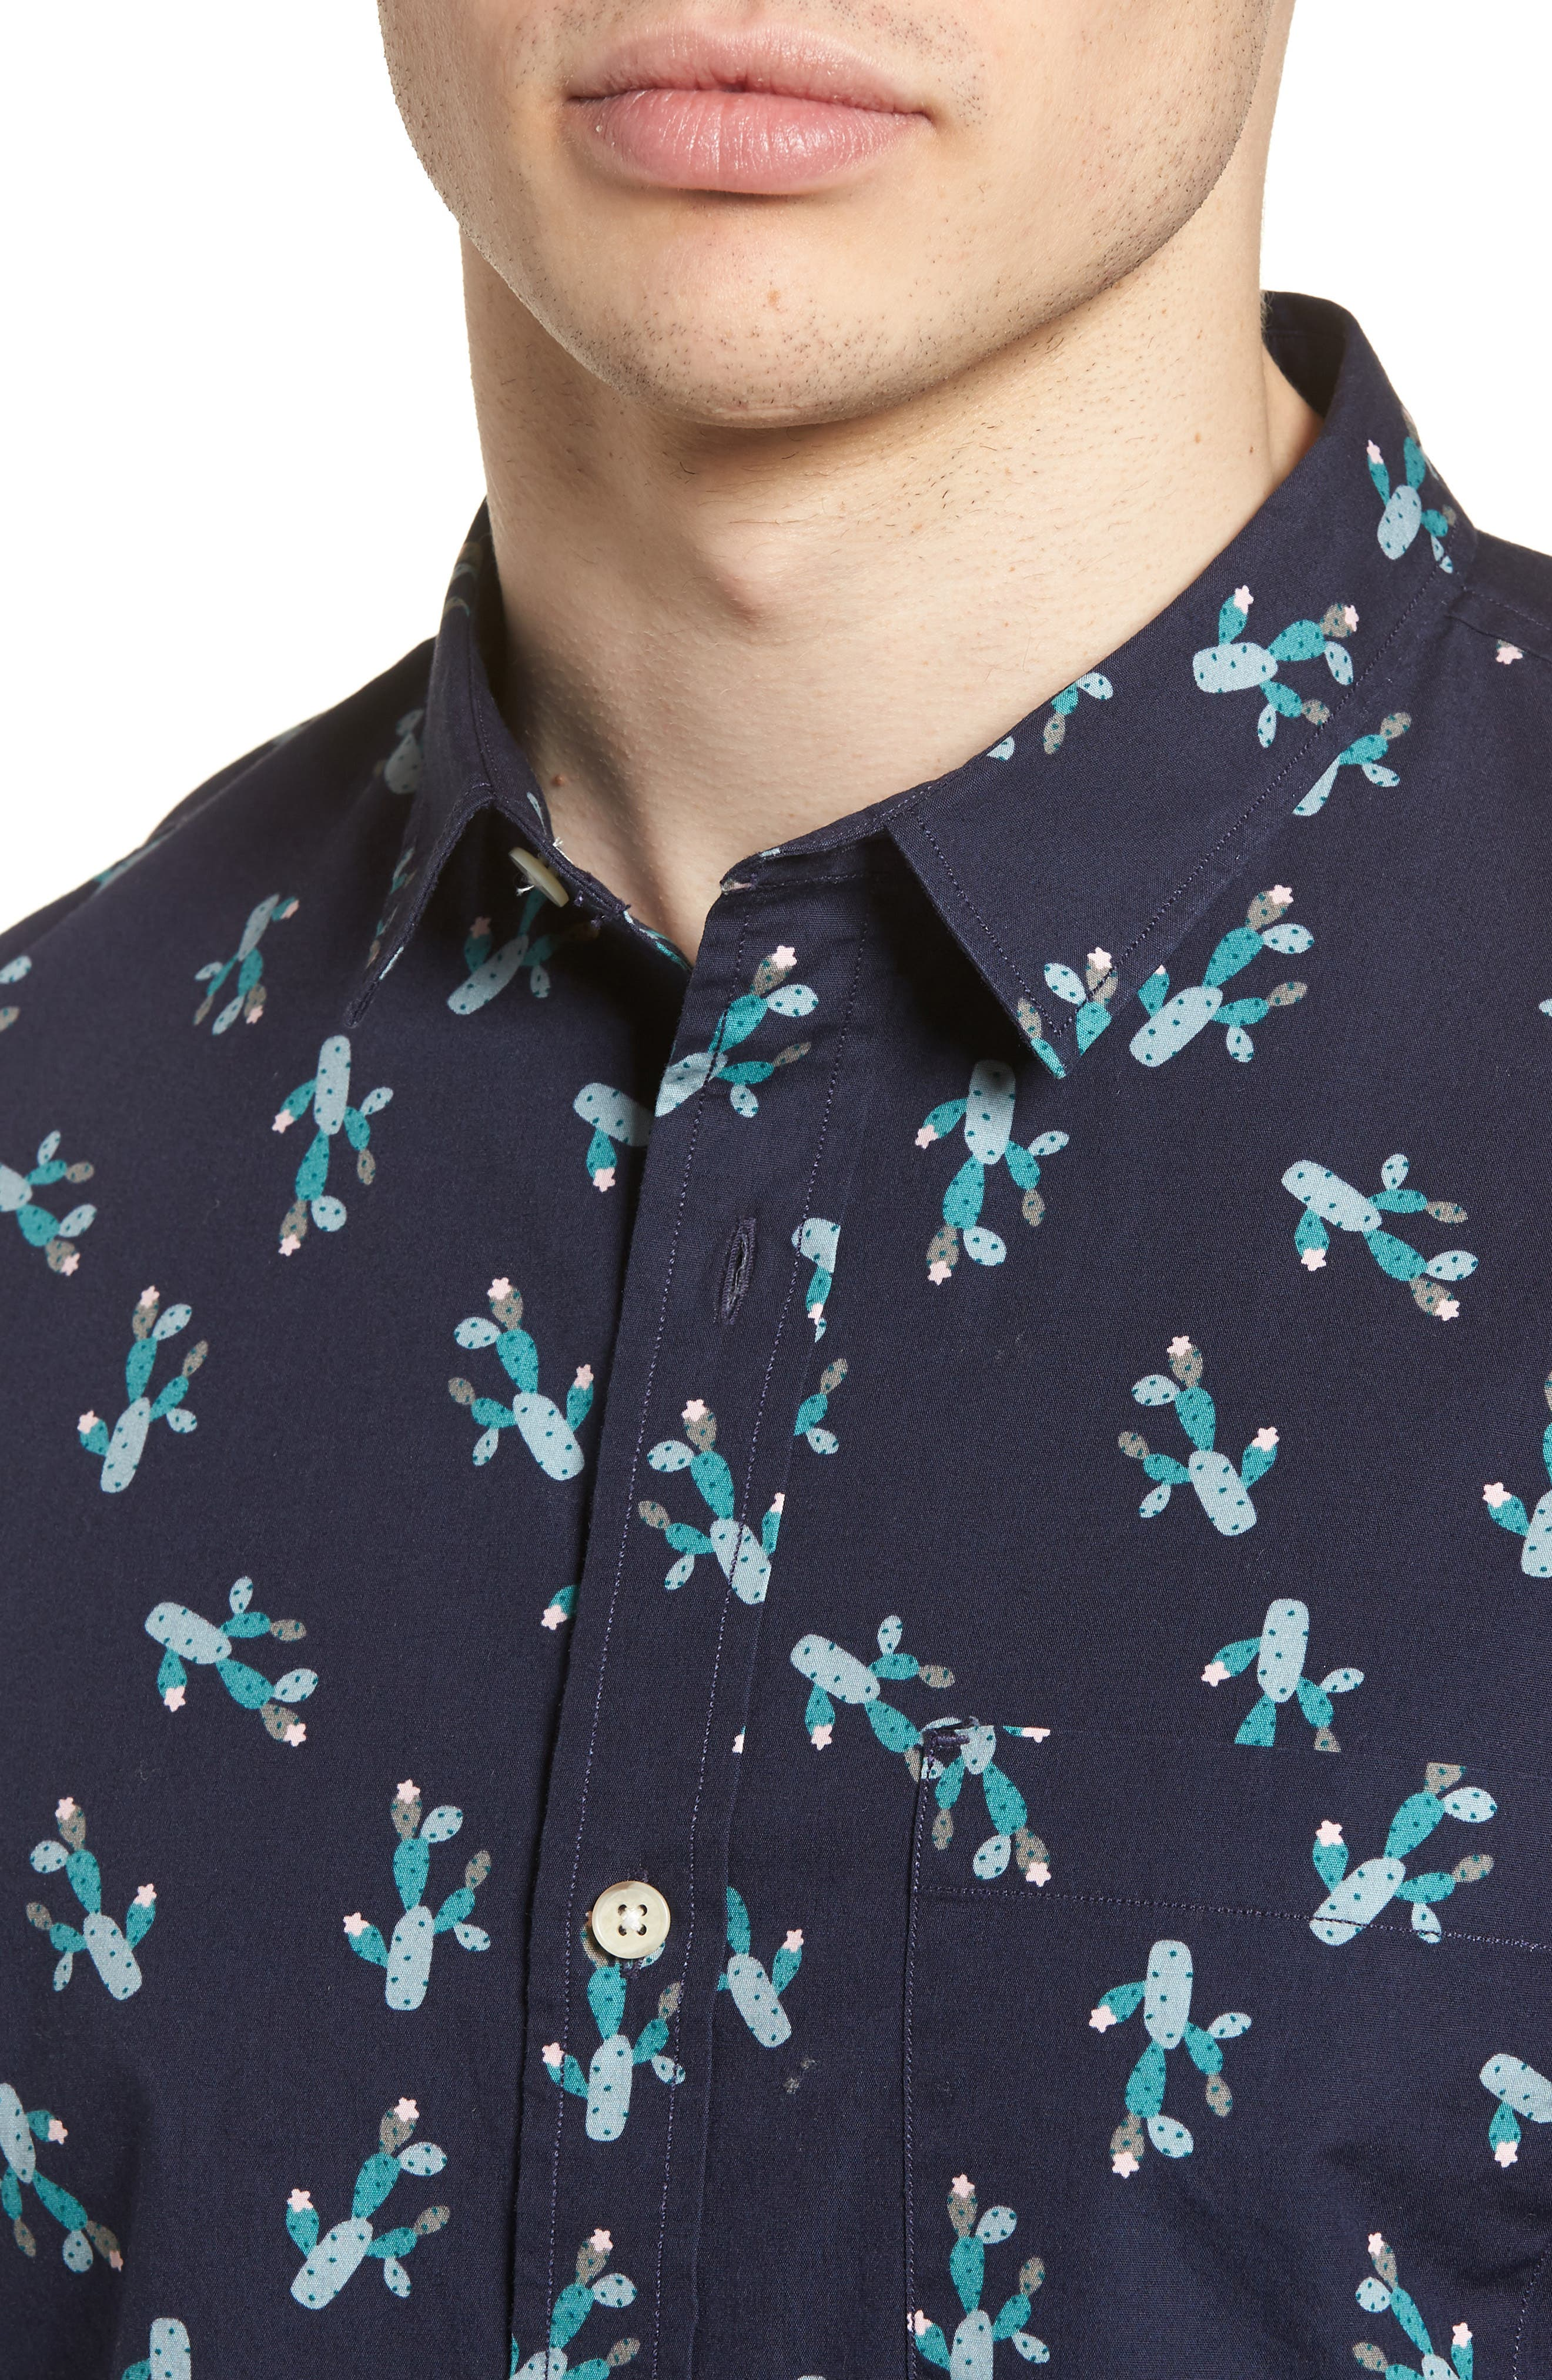 Print Woven Shirt,                             Alternate thumbnail 2, color,                             Navy Iris Cactus Print